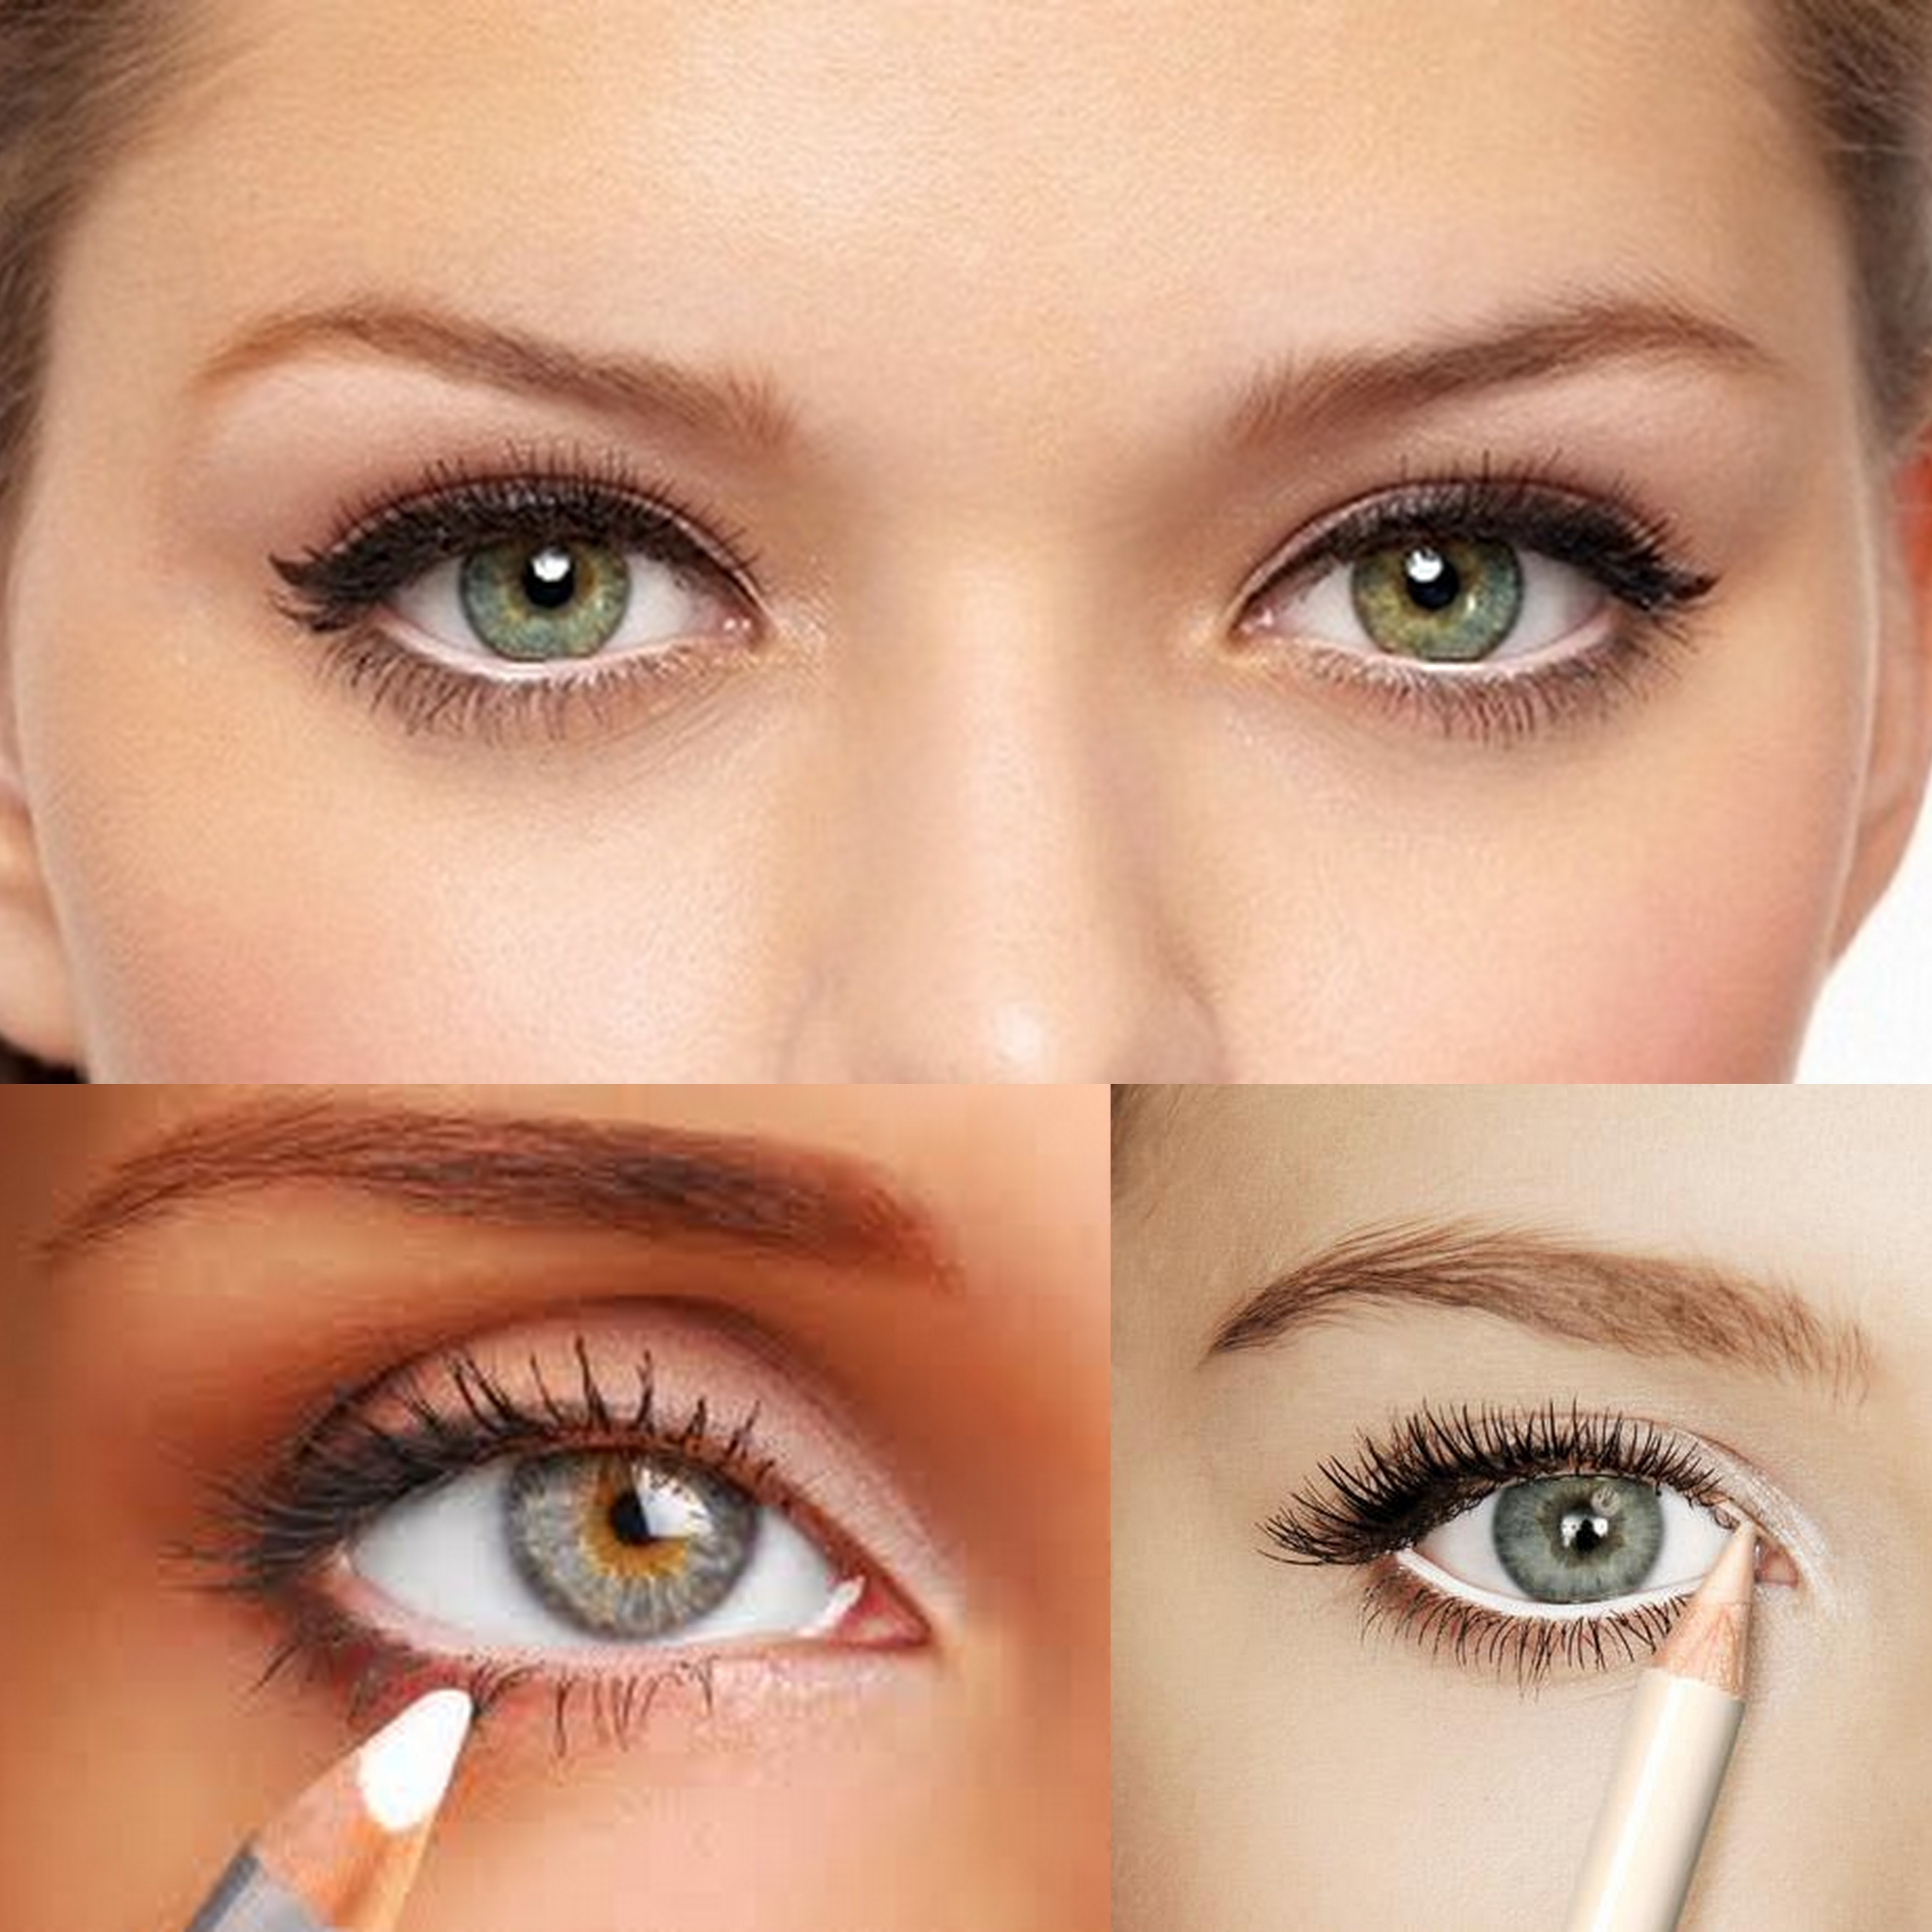 Eye Makeup For Small Eyes: Make Them Look Bigger